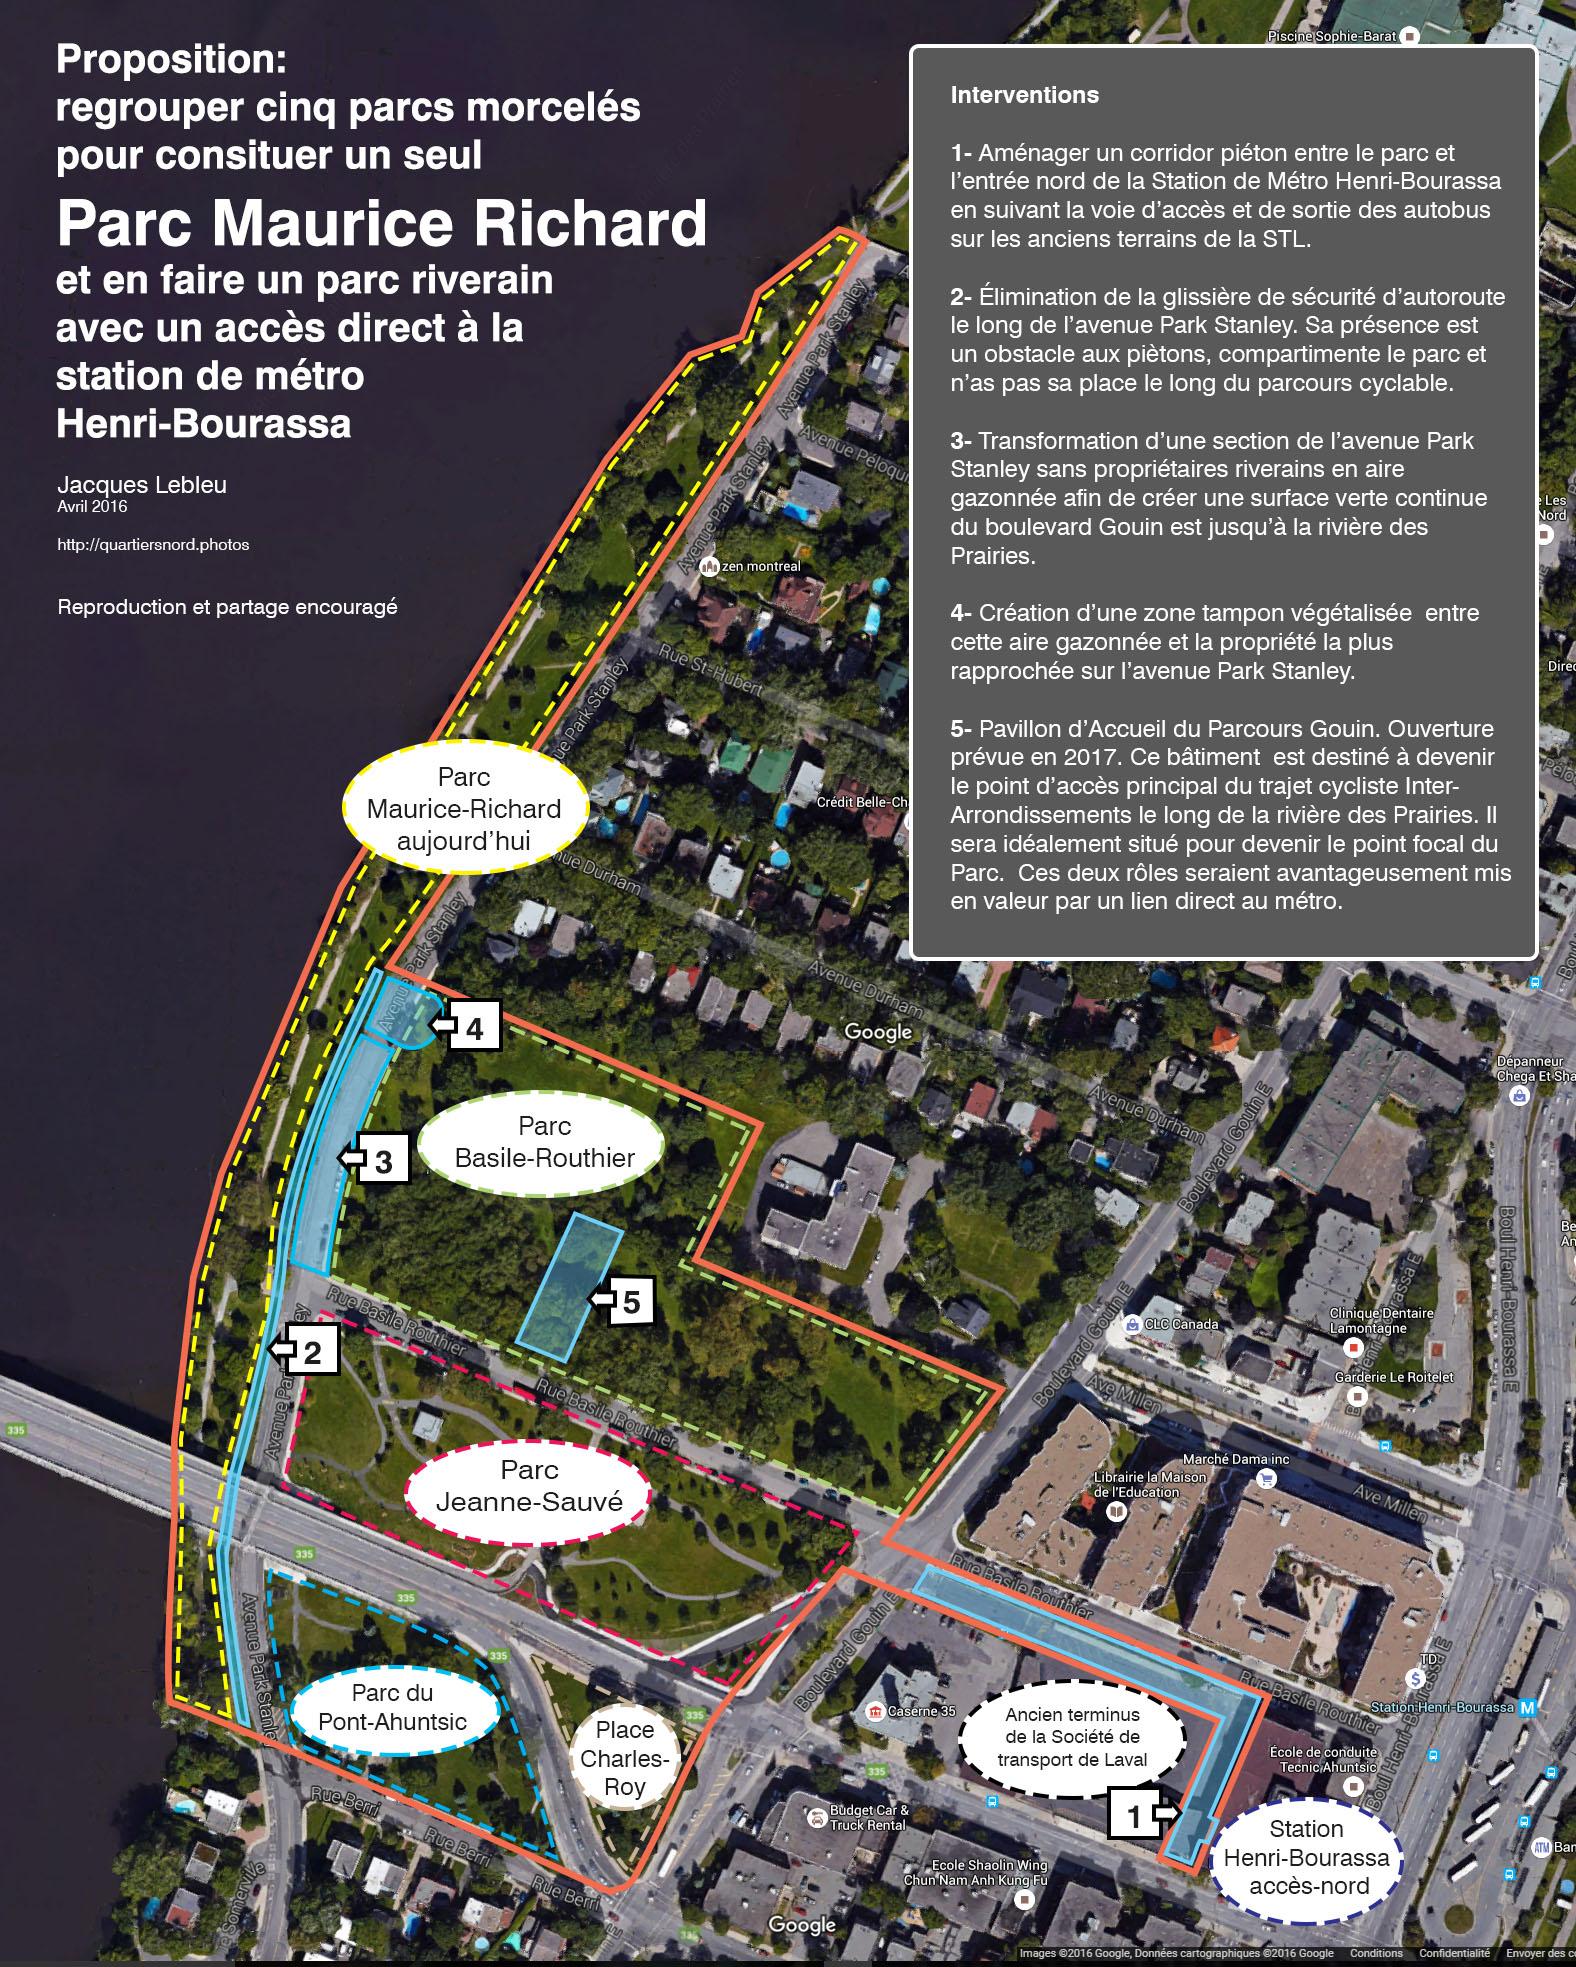 Proposition_Parc-Maurice-Richard.jpg